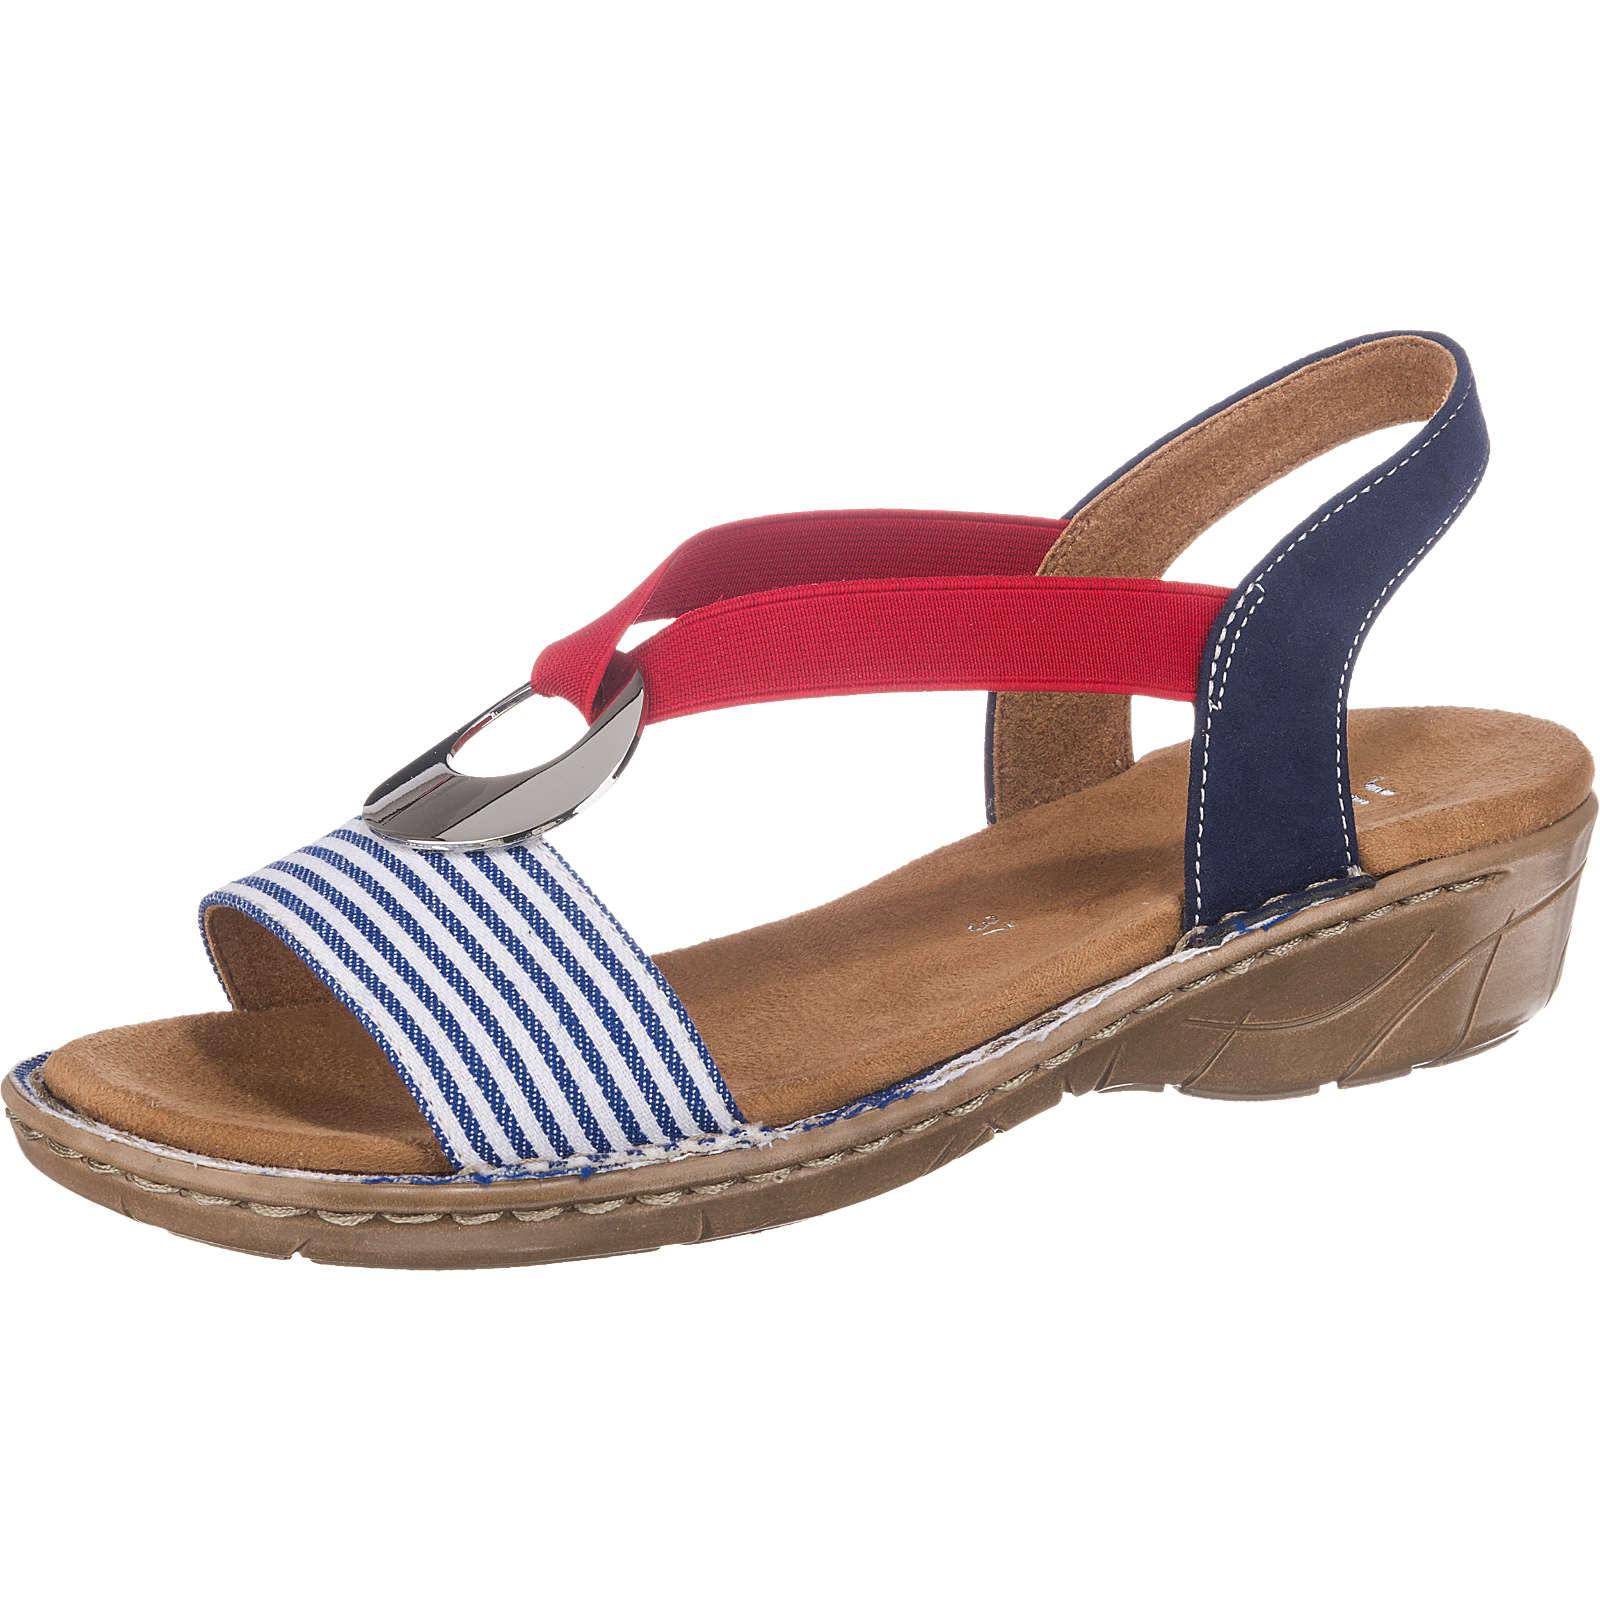 JENNY Korsika Klassische Sandalen blau-kombi Damen Gr. 40